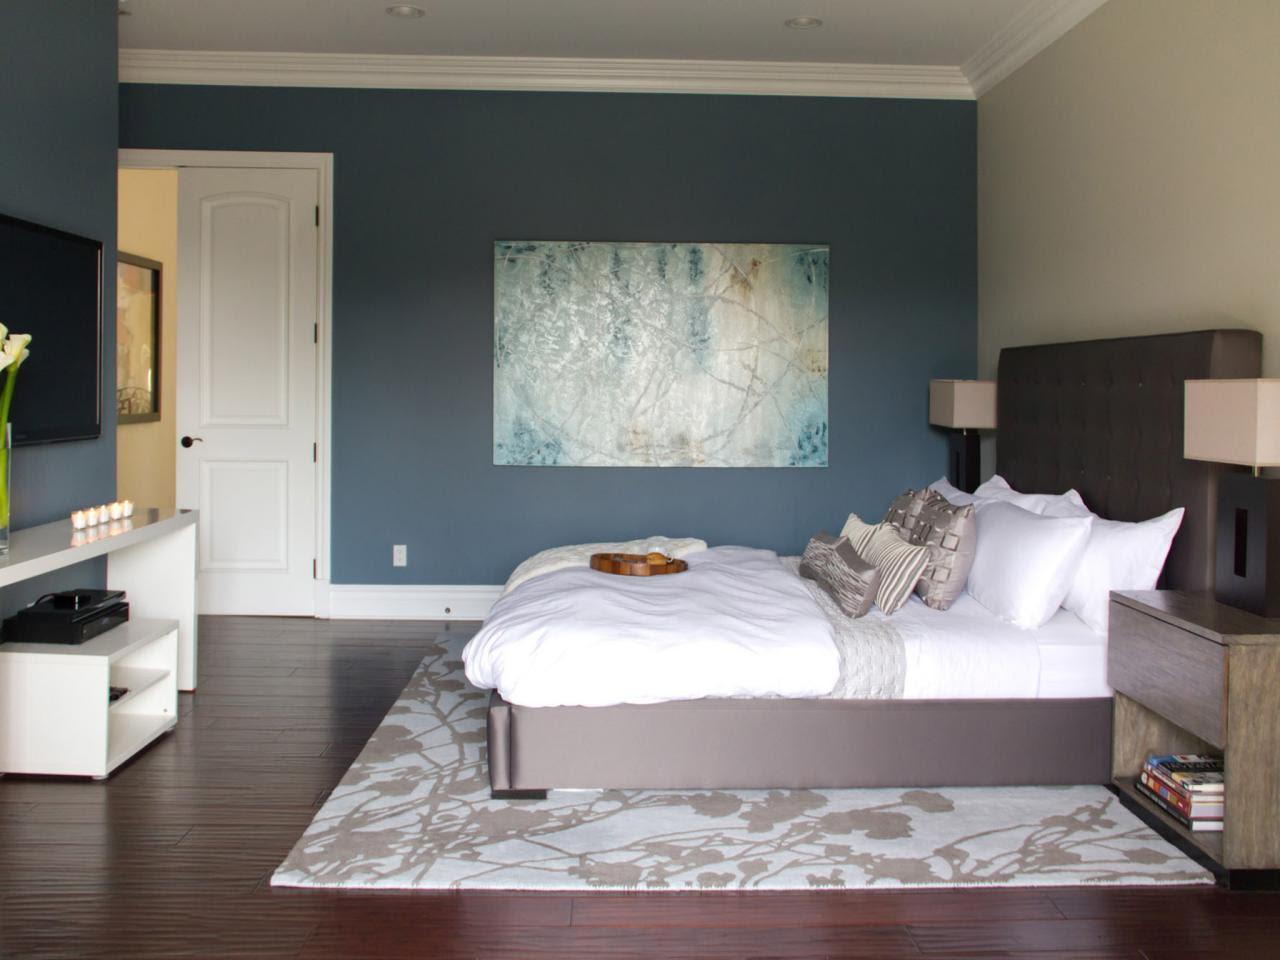 Master Bedroom Flooring: Pictures, Options & Ideas | HGTV